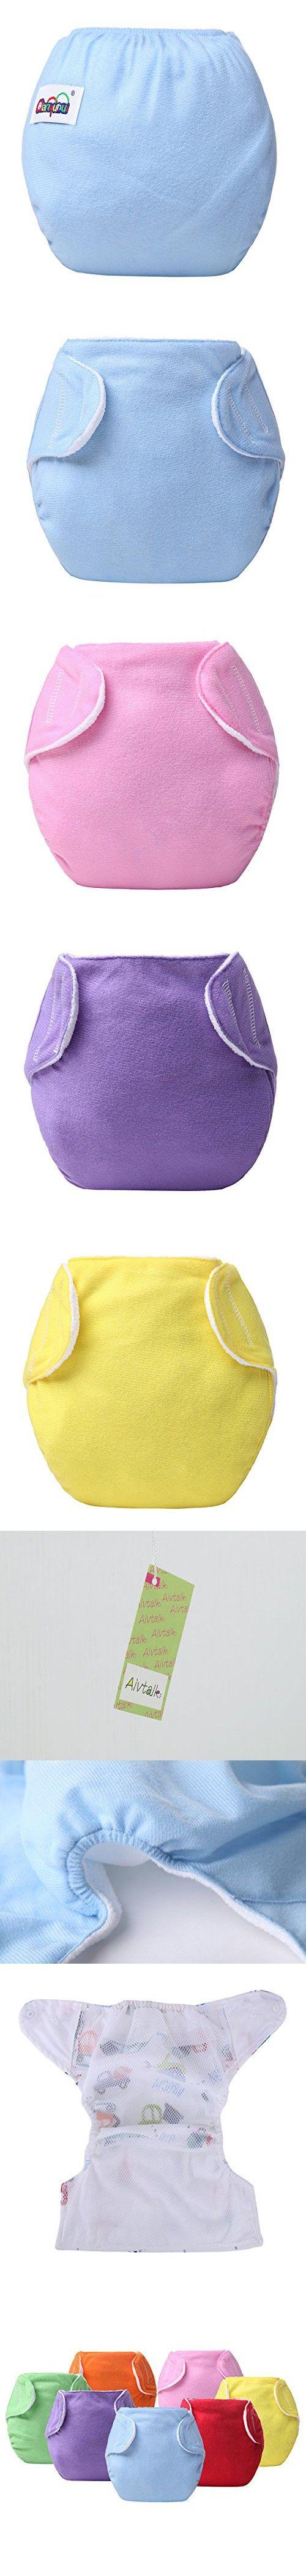 Aivtalk 7Pcs Baby Boys Girls Toddler Toilet Pee Potty Training Pants Newborn Diapers Cloth Diaper